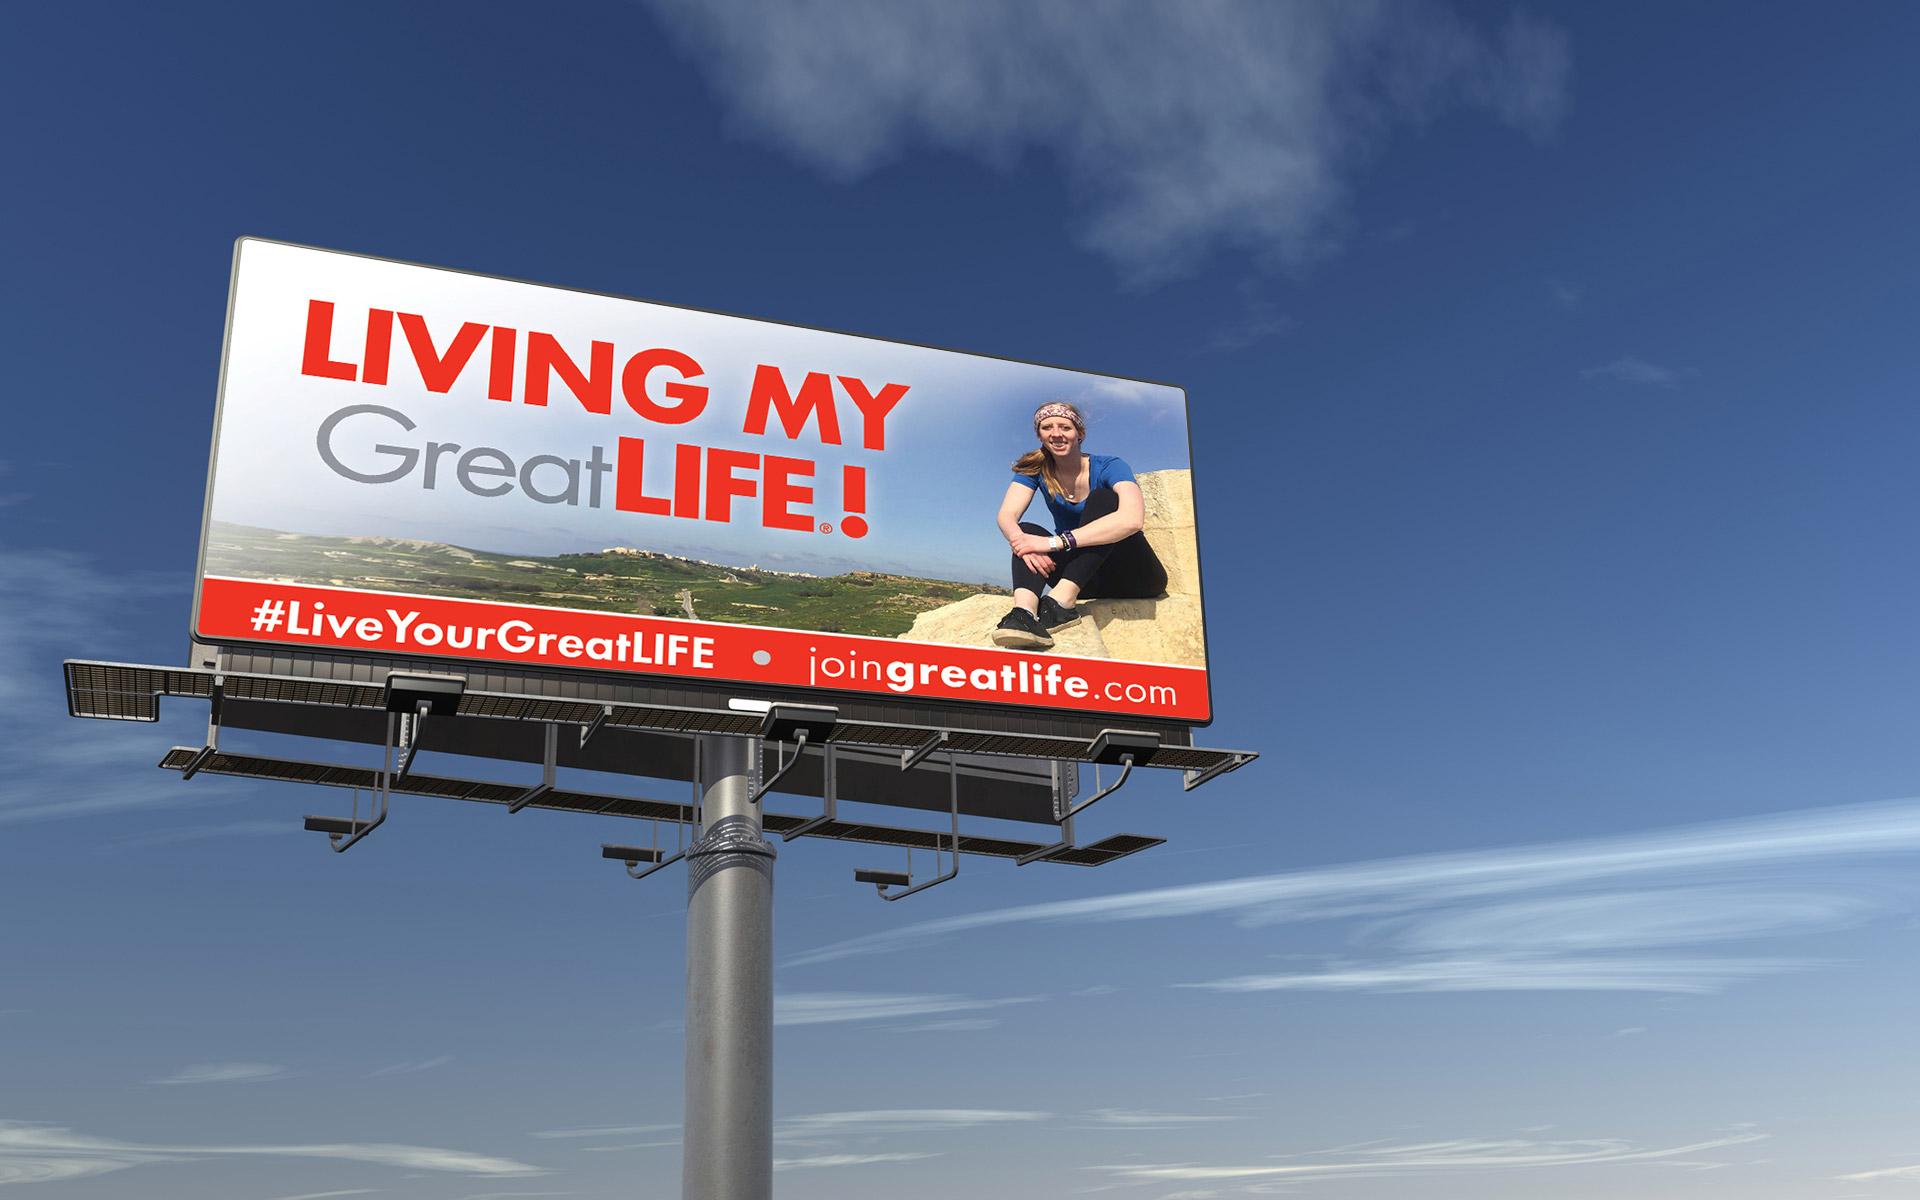 GreatLIFE Billboard